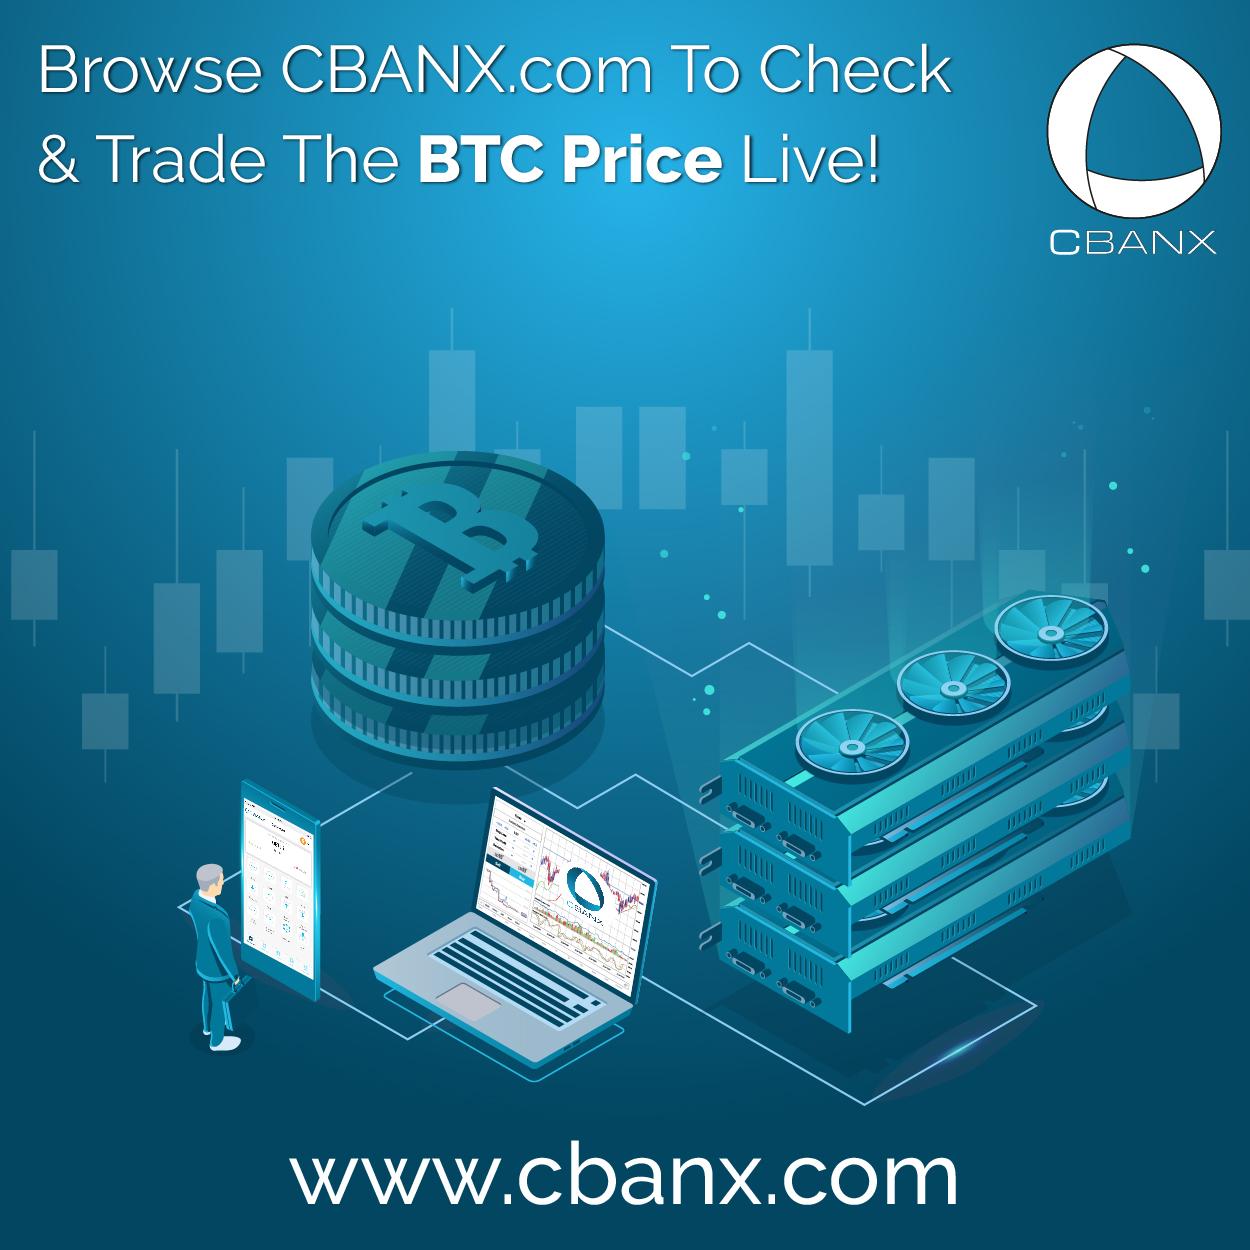 Browse CBANX.com To Check And Trade The BTC Price Live!